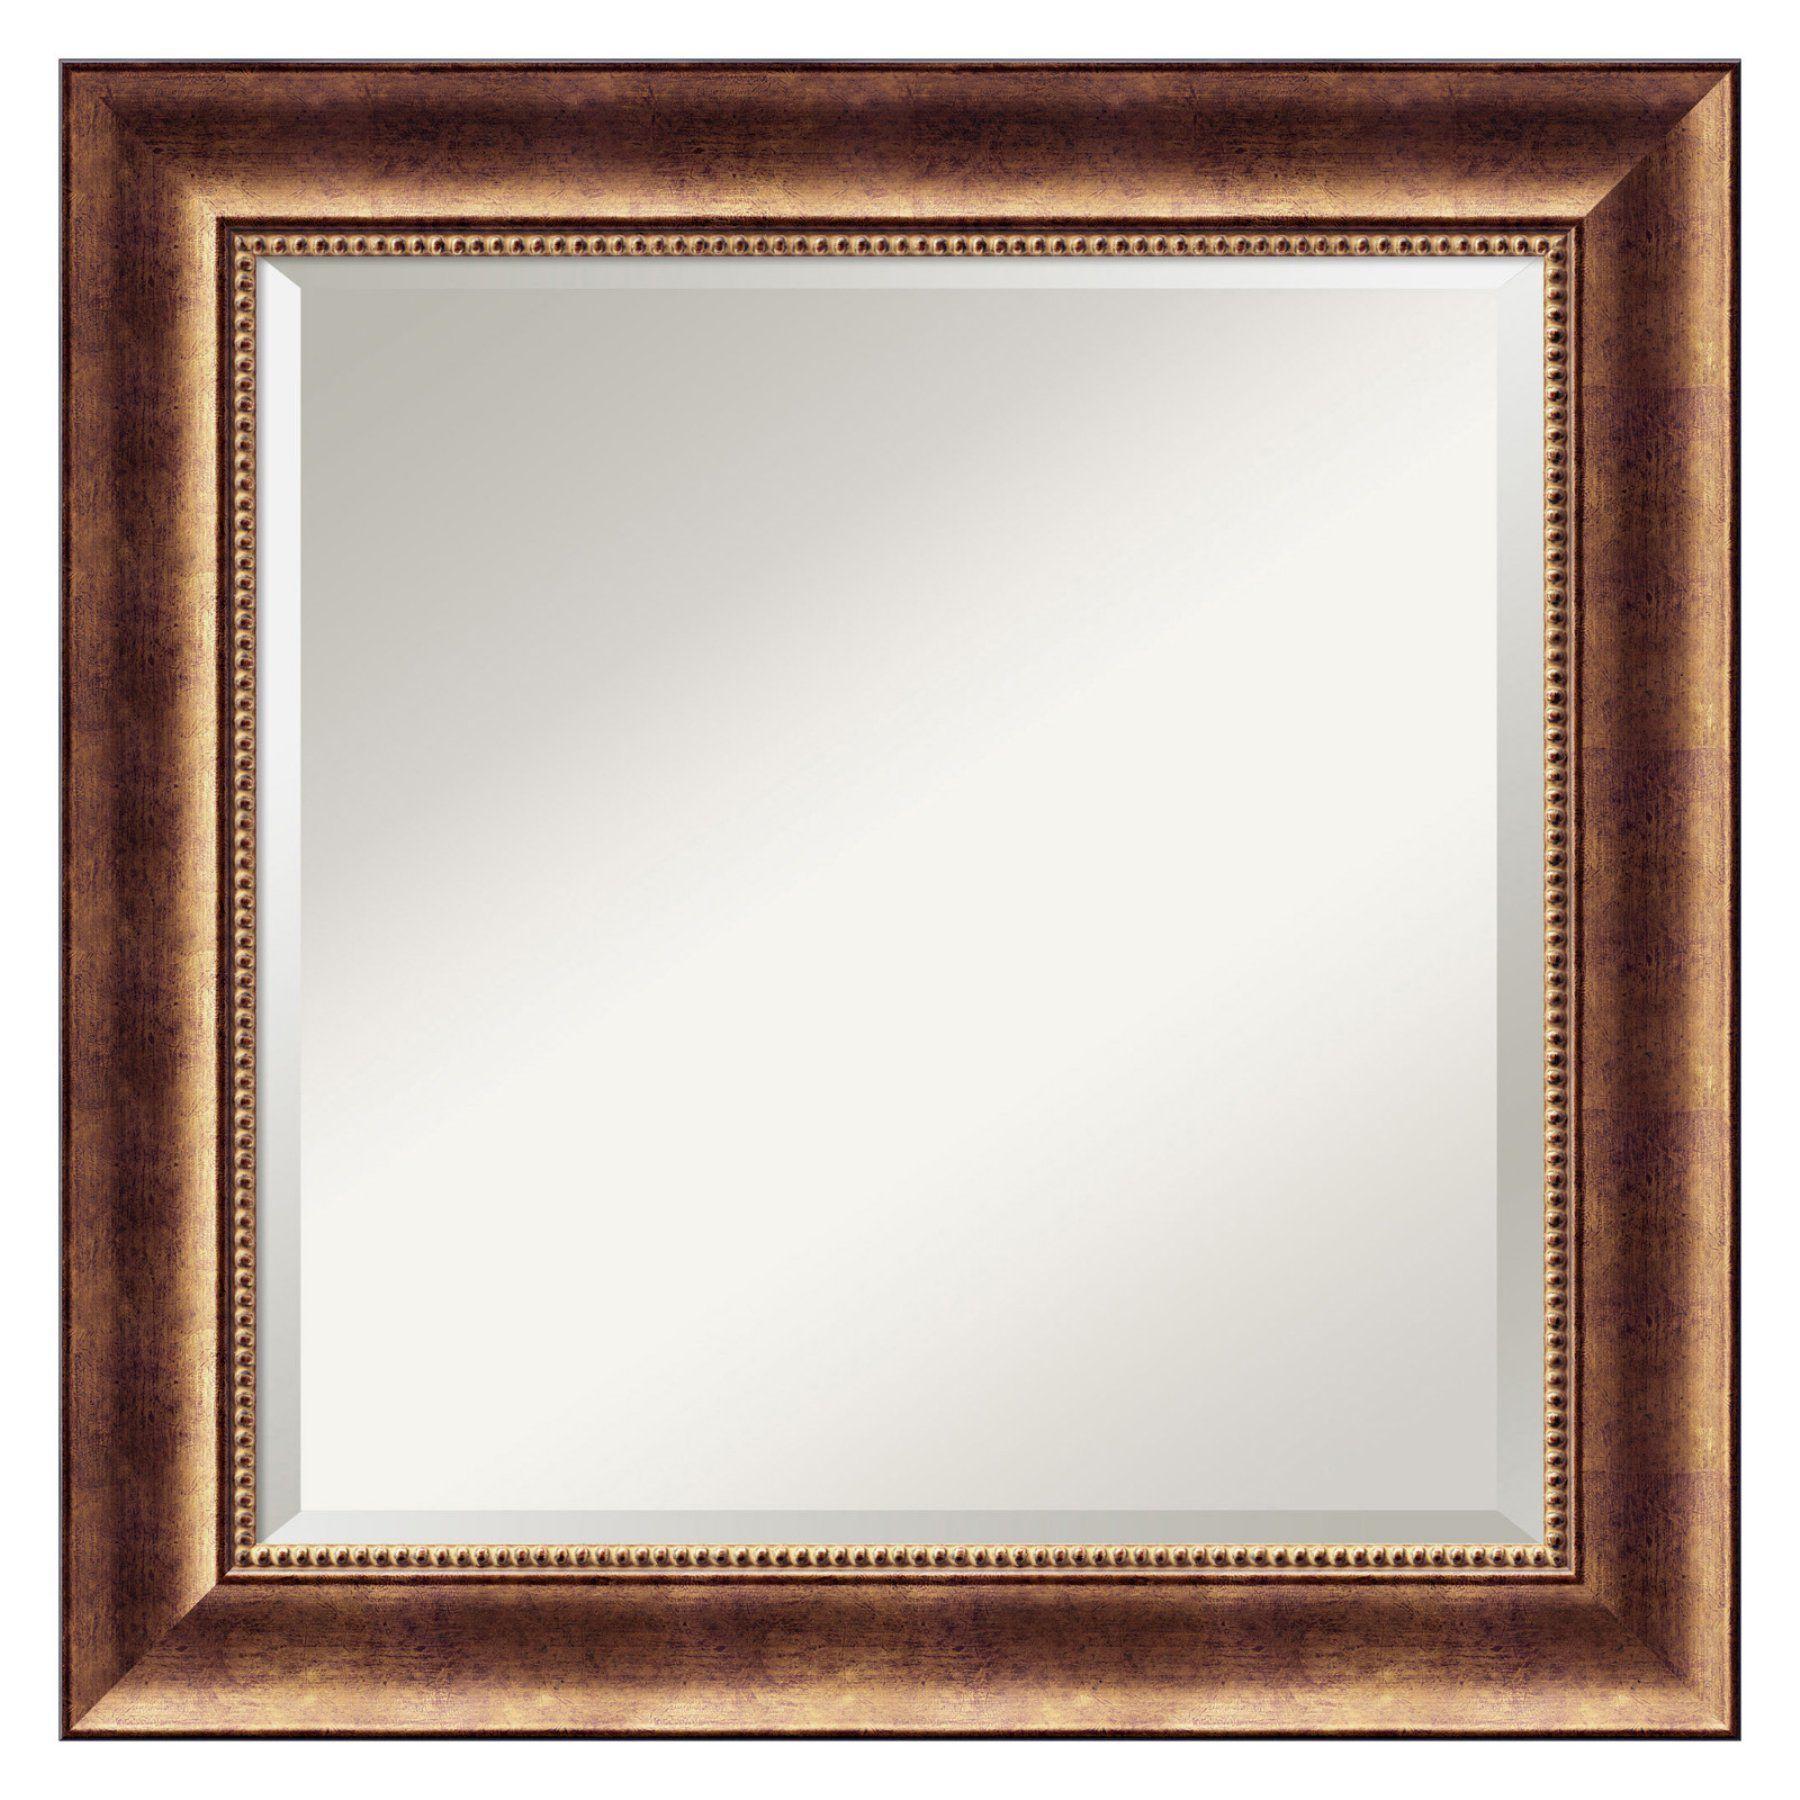 Manhattan Square Wall Mirror - 25.5W x 25.5H in. - DSW01485